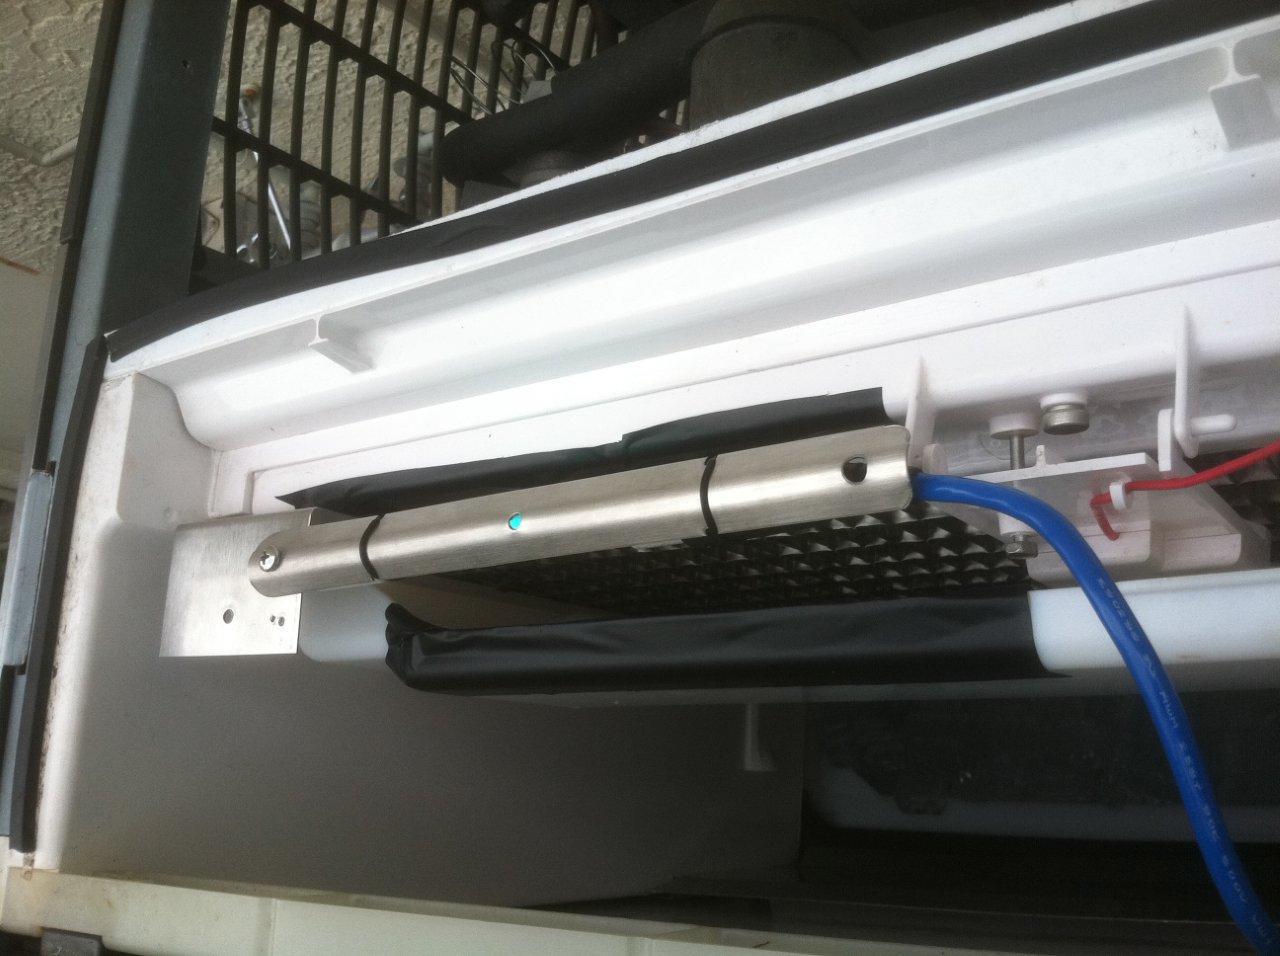 ICE UV Shield accessory